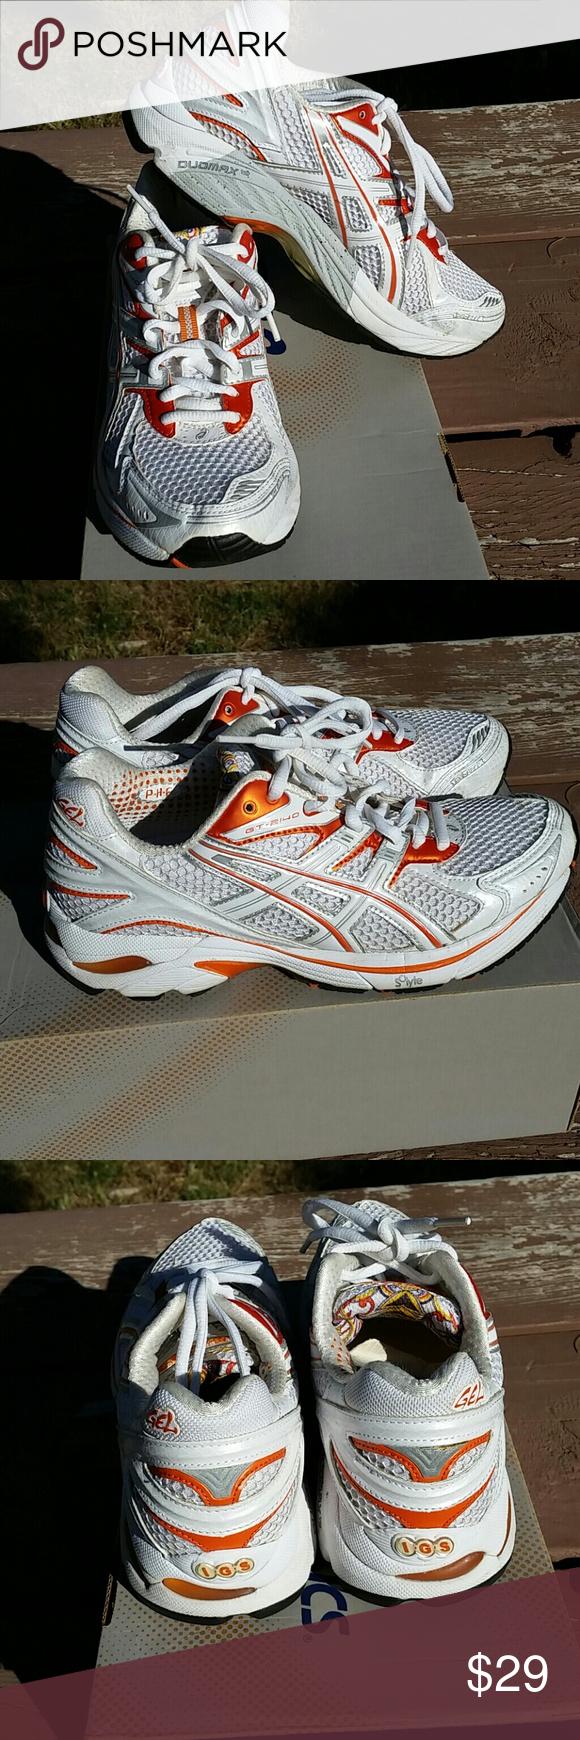 Asics GT 2140 orange white size 7 Very good condition